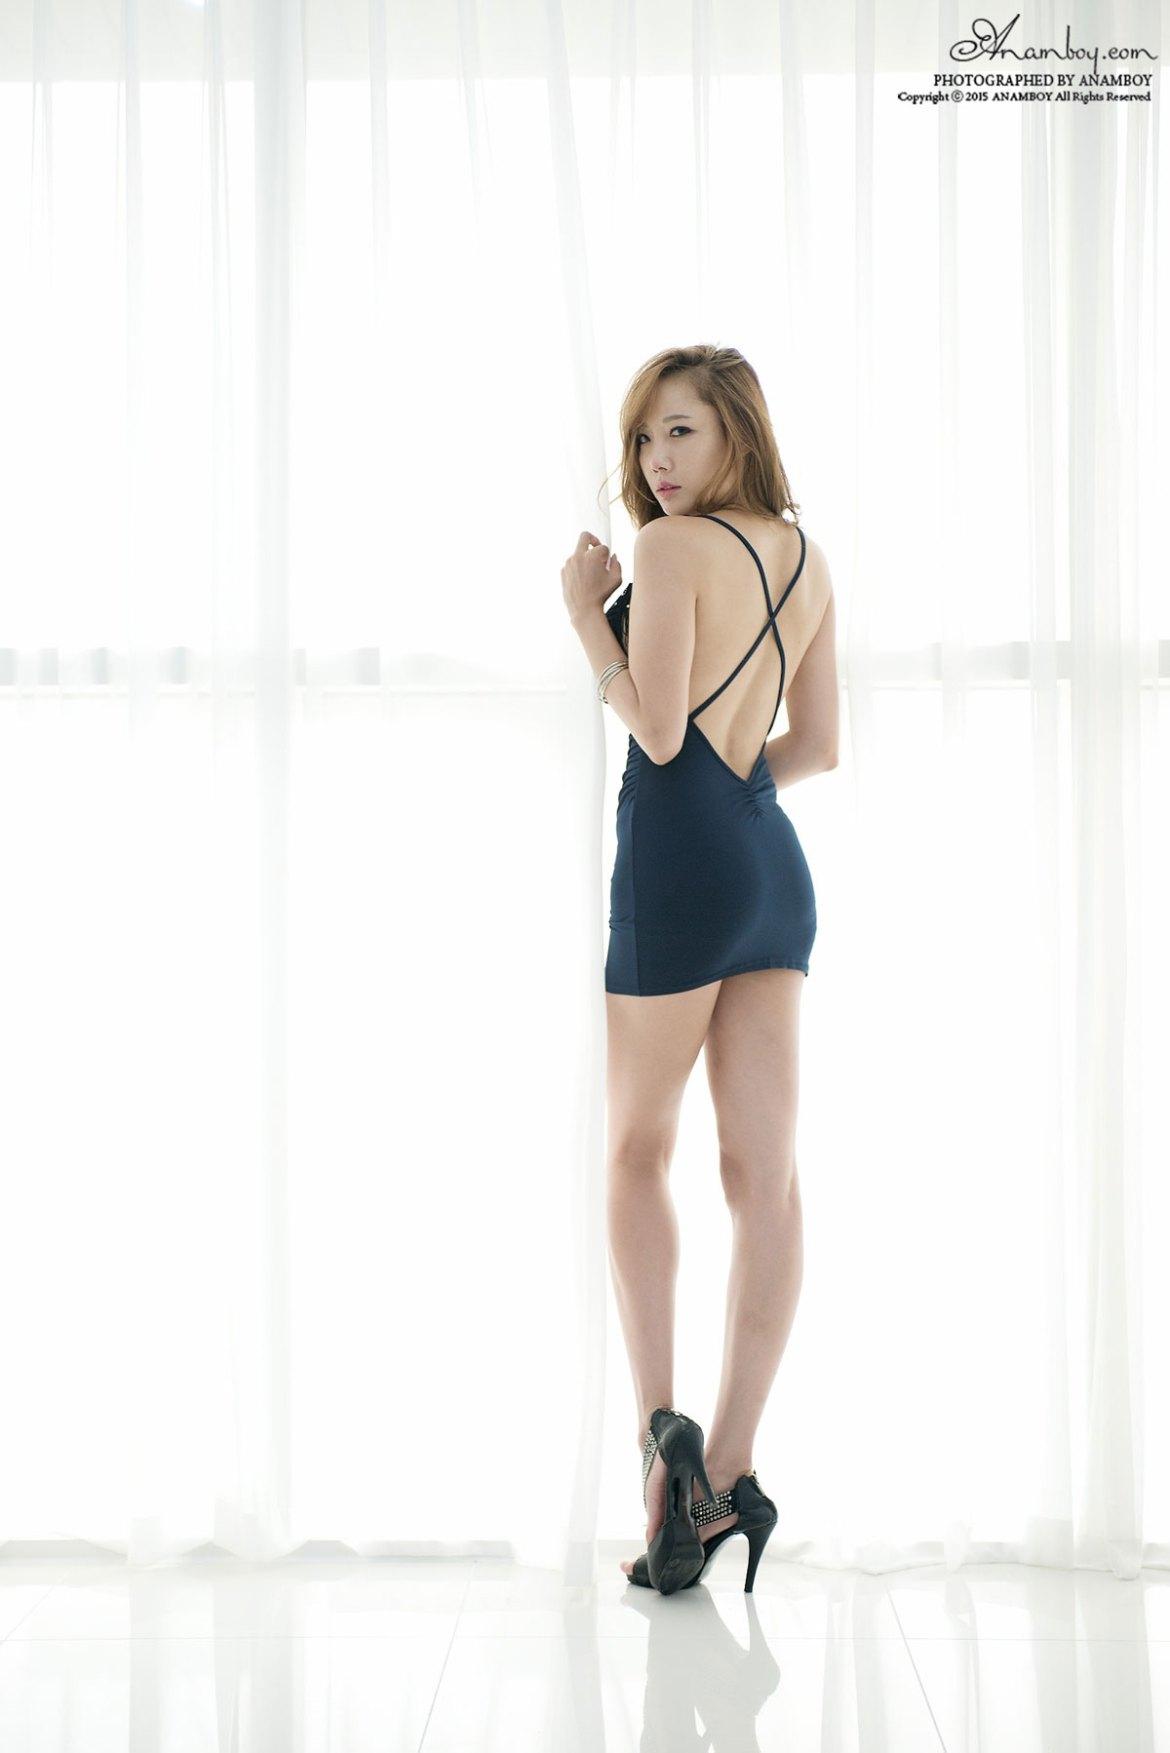 Seo Aran blue dress studio photoshoot